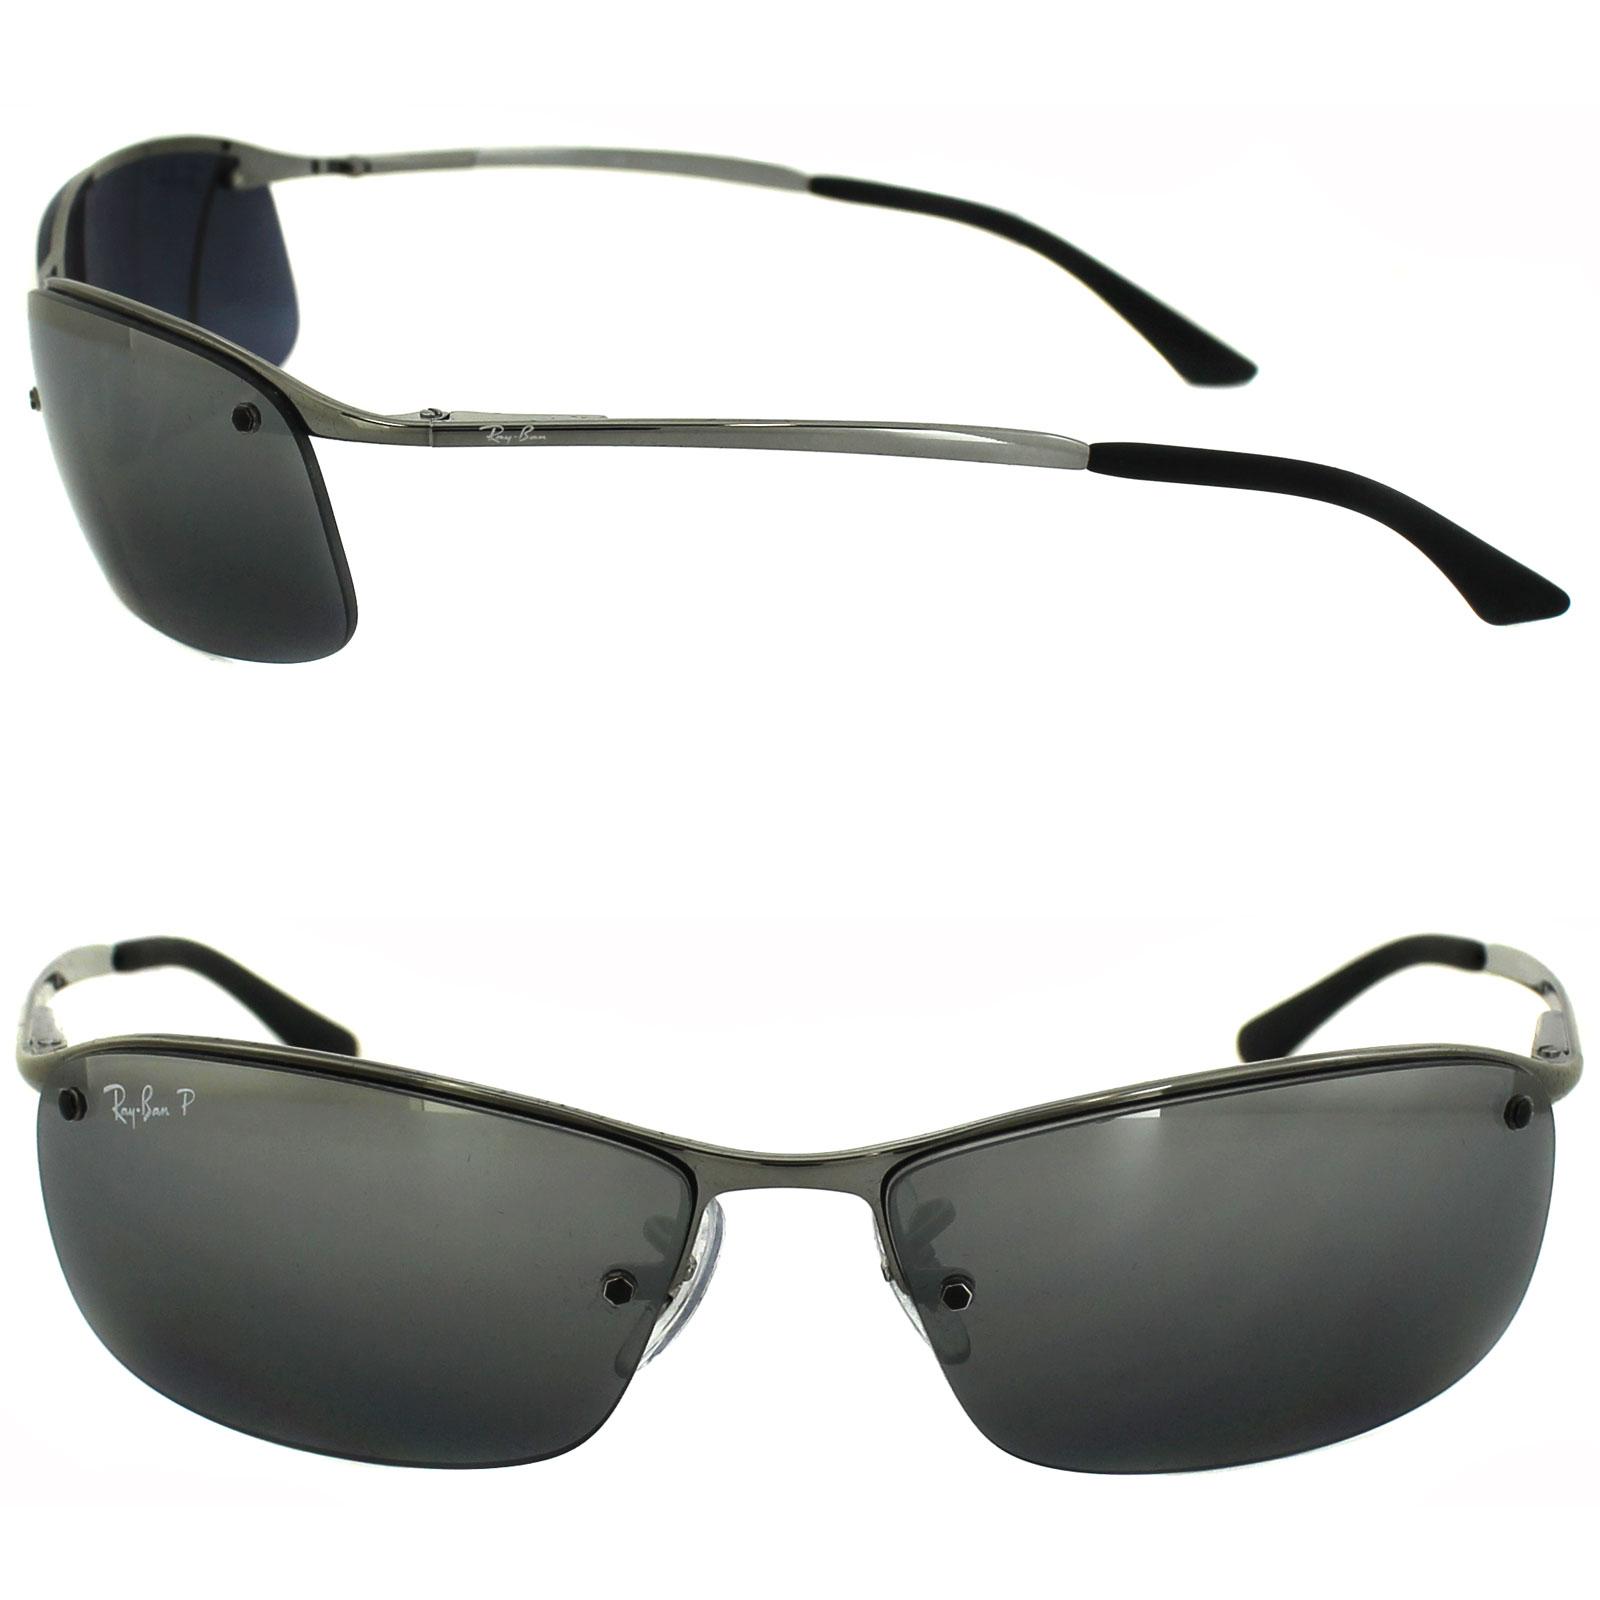 df843b918e89 ... discount sentinel ray ban sunglasses 3183 004 82 gunmetal silver mirror  polarized 1dc0e a77d2